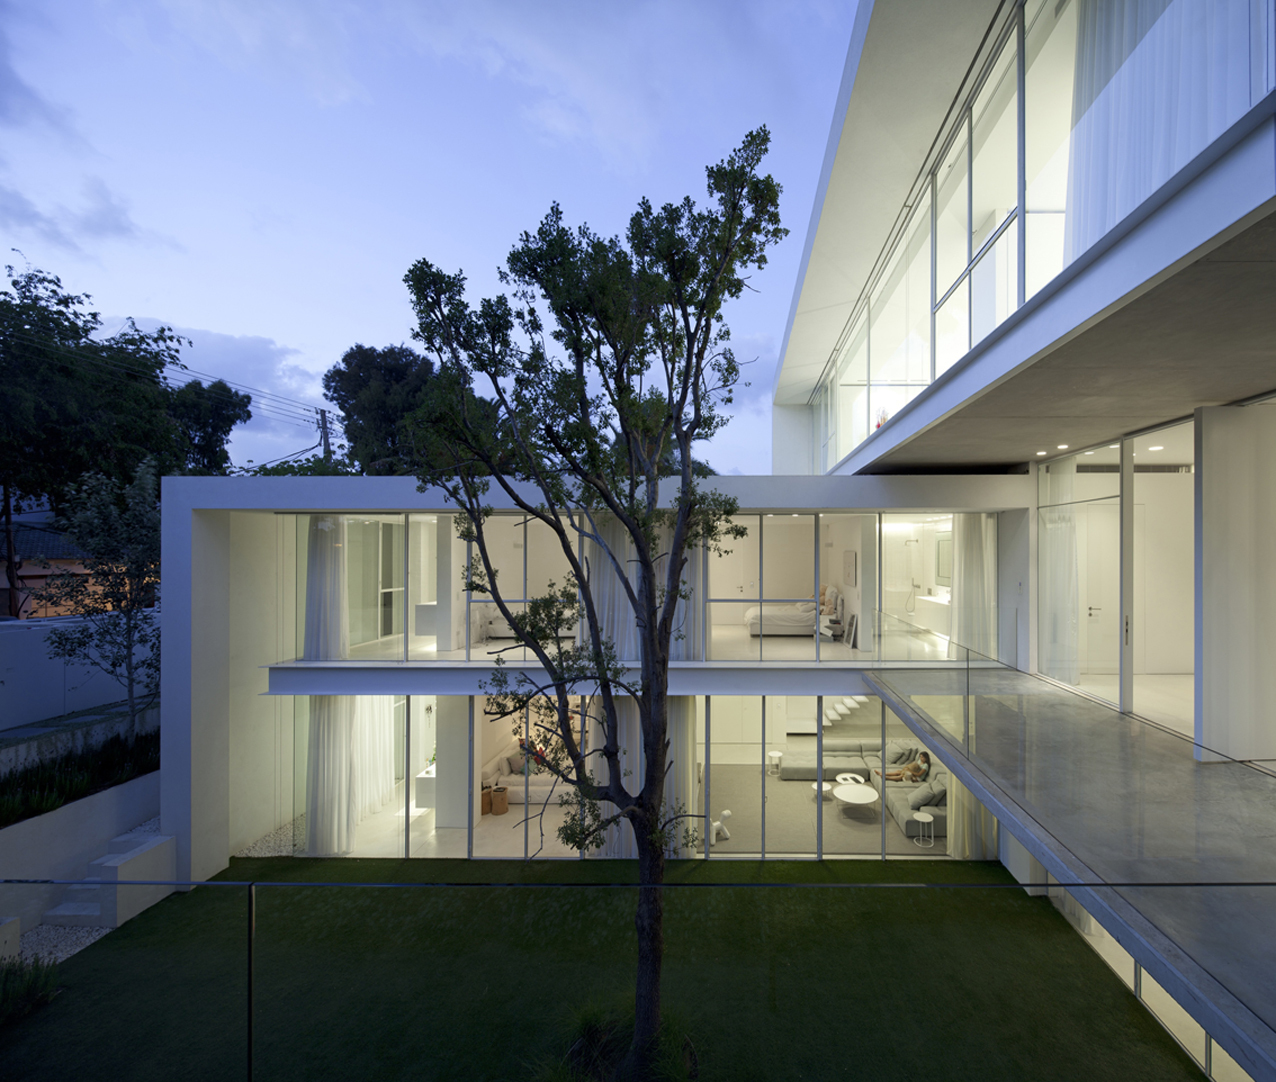 barak-house-pitsou-kedem-architects_barak_house_121